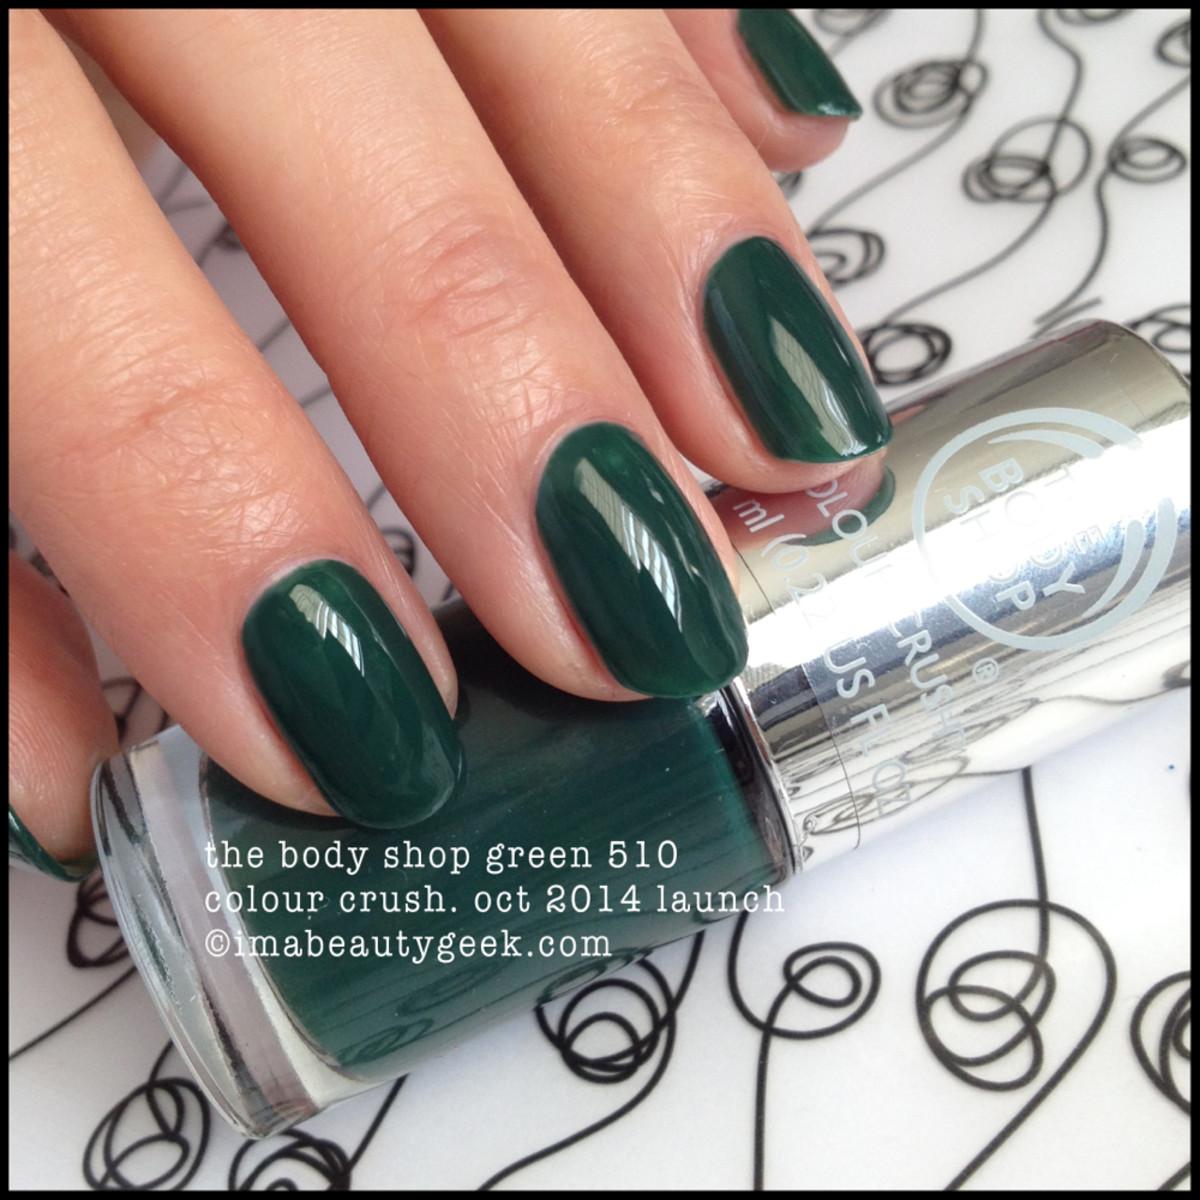 Body Shop Polish The Body Shop Green 510 Colour Crush